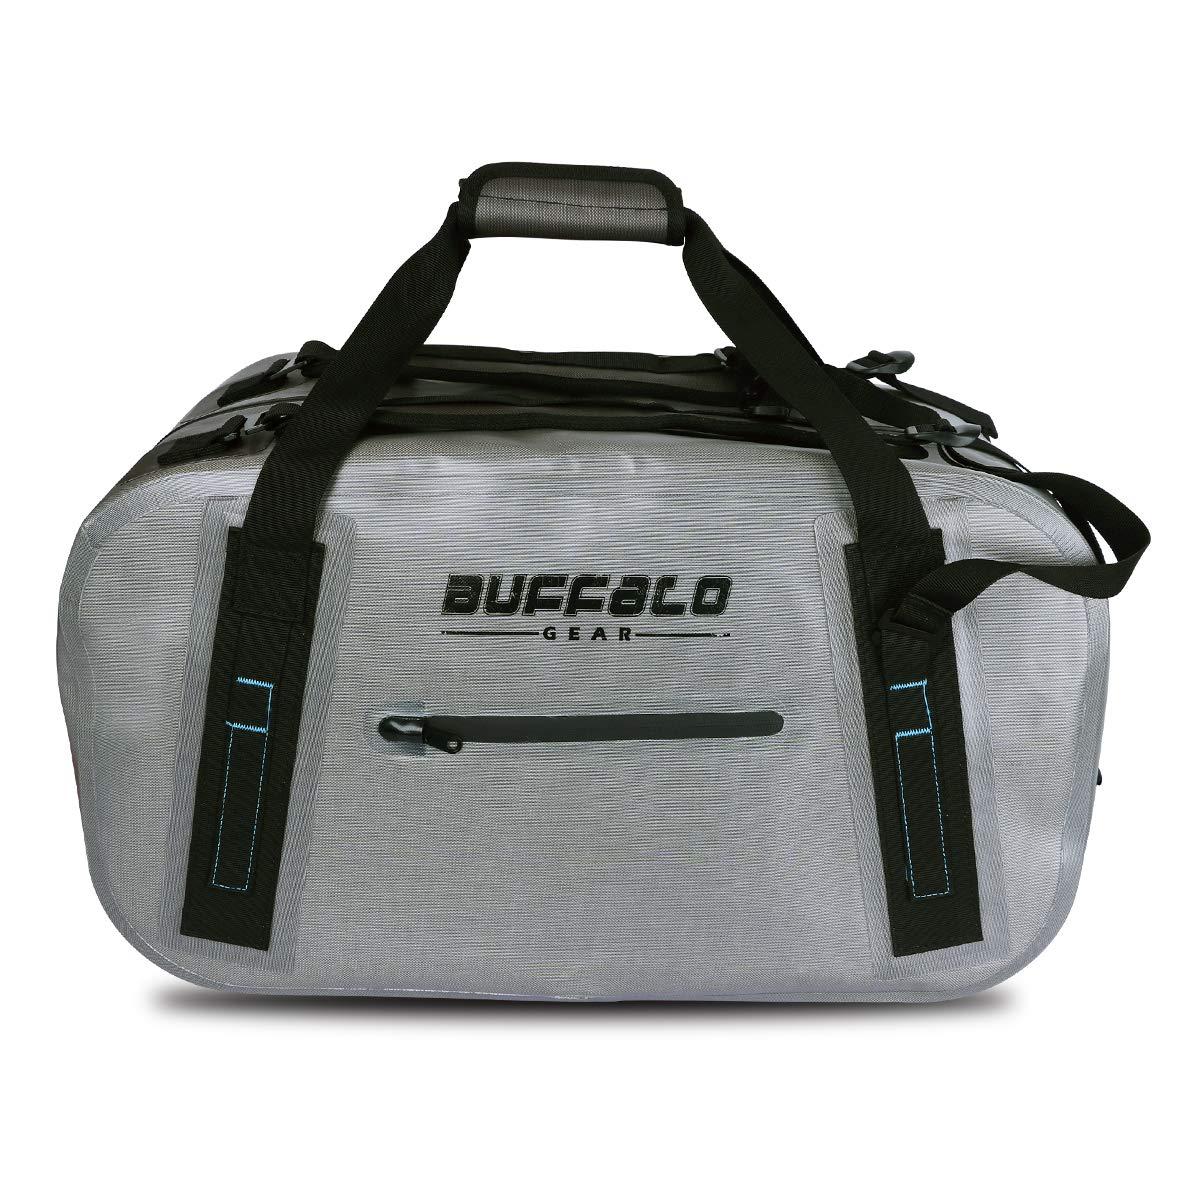 Buffalo Gear Waterproof Duffel Bag 50L Large Grey 840D TPU Dry Bag Dry Bag for Travel, Motorcycling, Cycling, Hiking, Camping, Kayaking, Beach, Boating Swimming Rafting Fishing and Watersports by Buffalo Gear